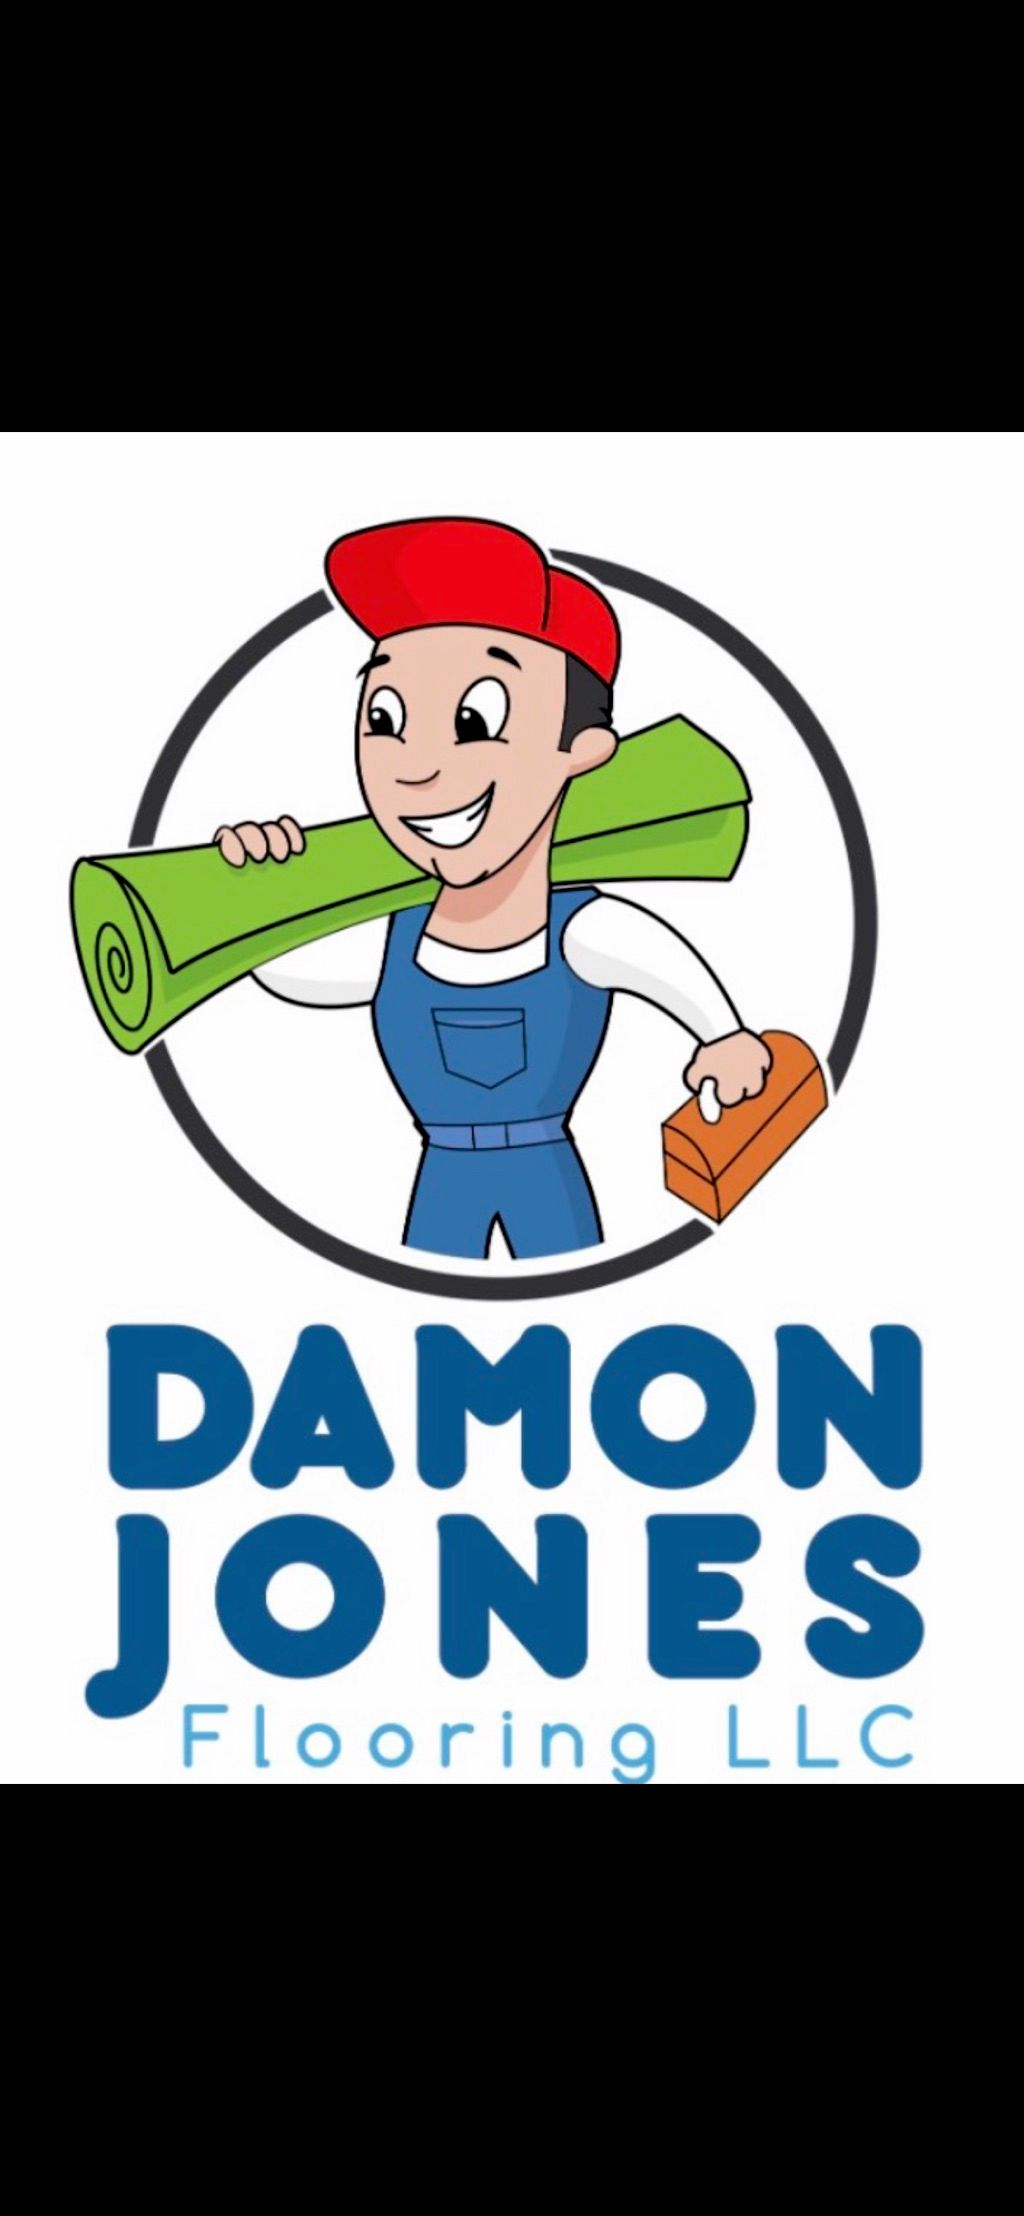 Damon Jones Flooring LLC